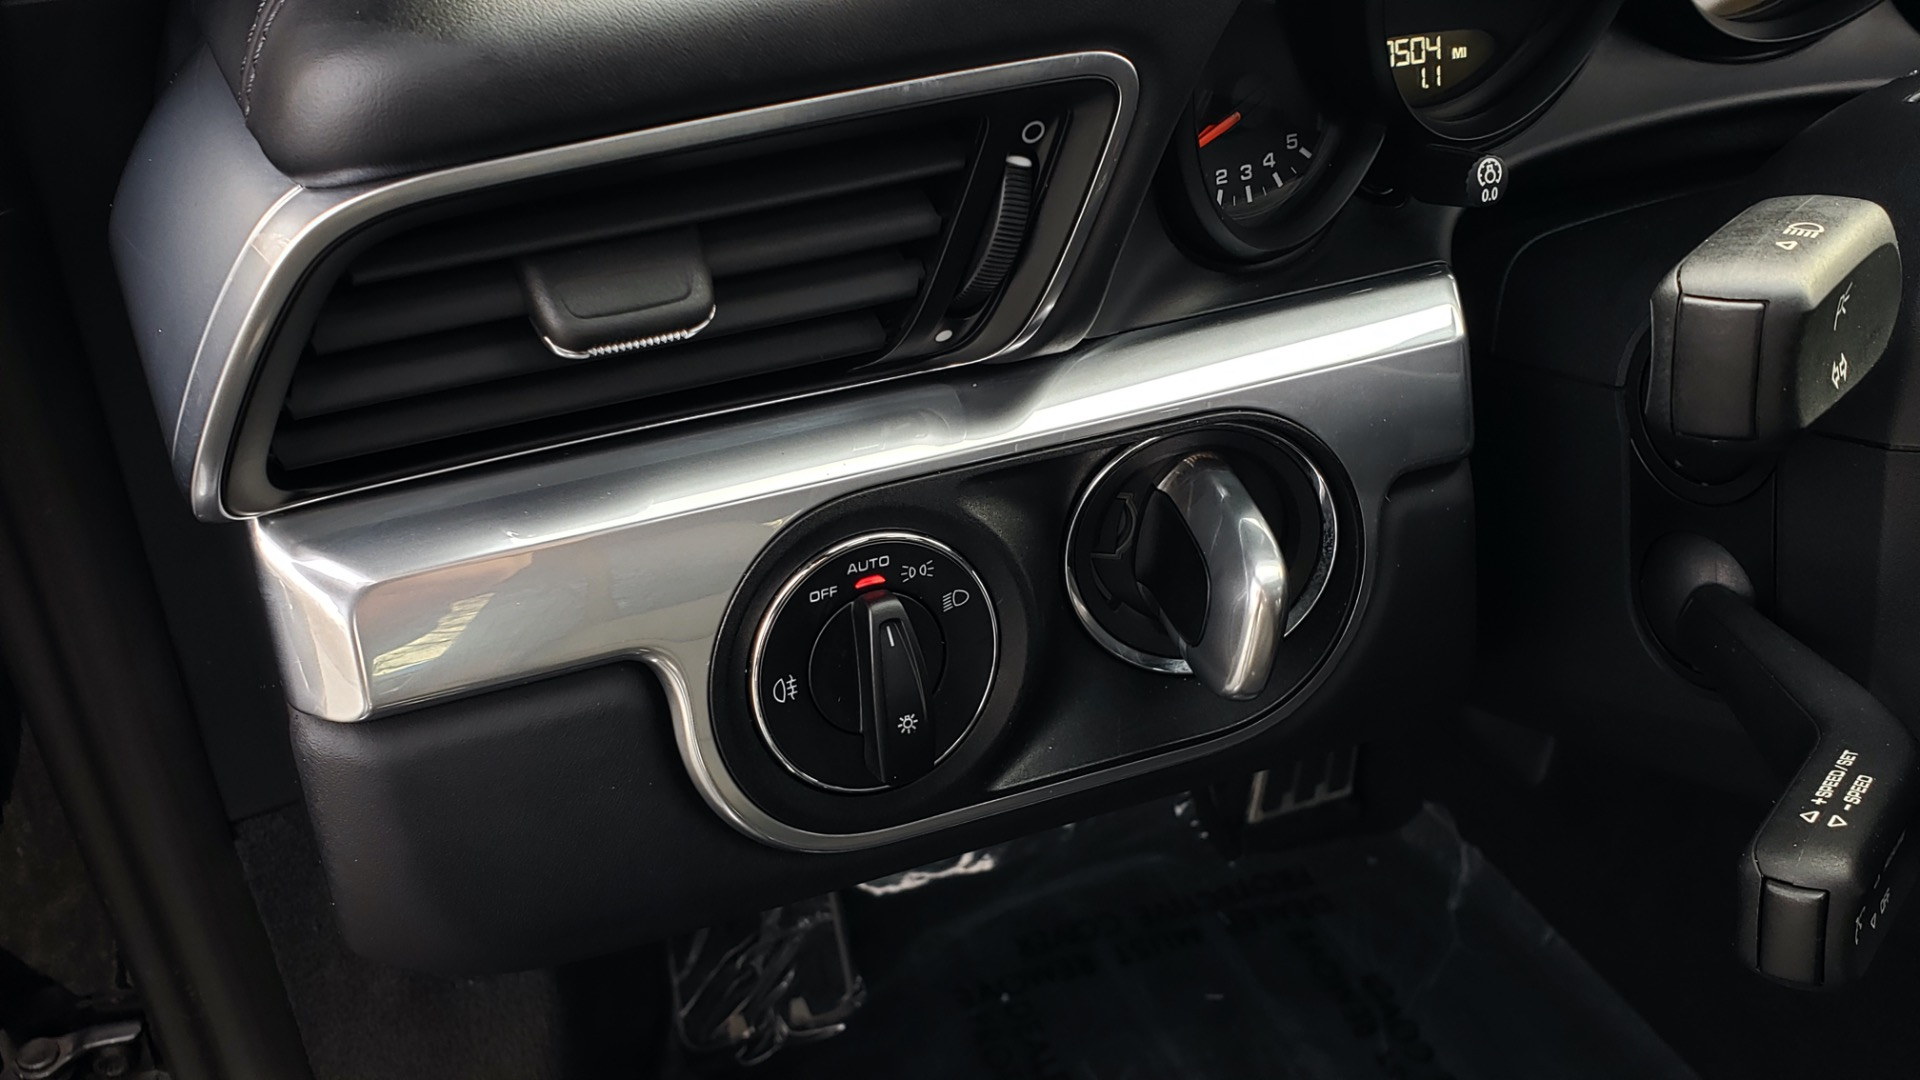 Used 2014 Porsche 911 CARRERA 4S / PREM PKG PLUS / NAV / SUNROO / BOSE / CHRONO for sale Sold at Formula Imports in Charlotte NC 28227 39